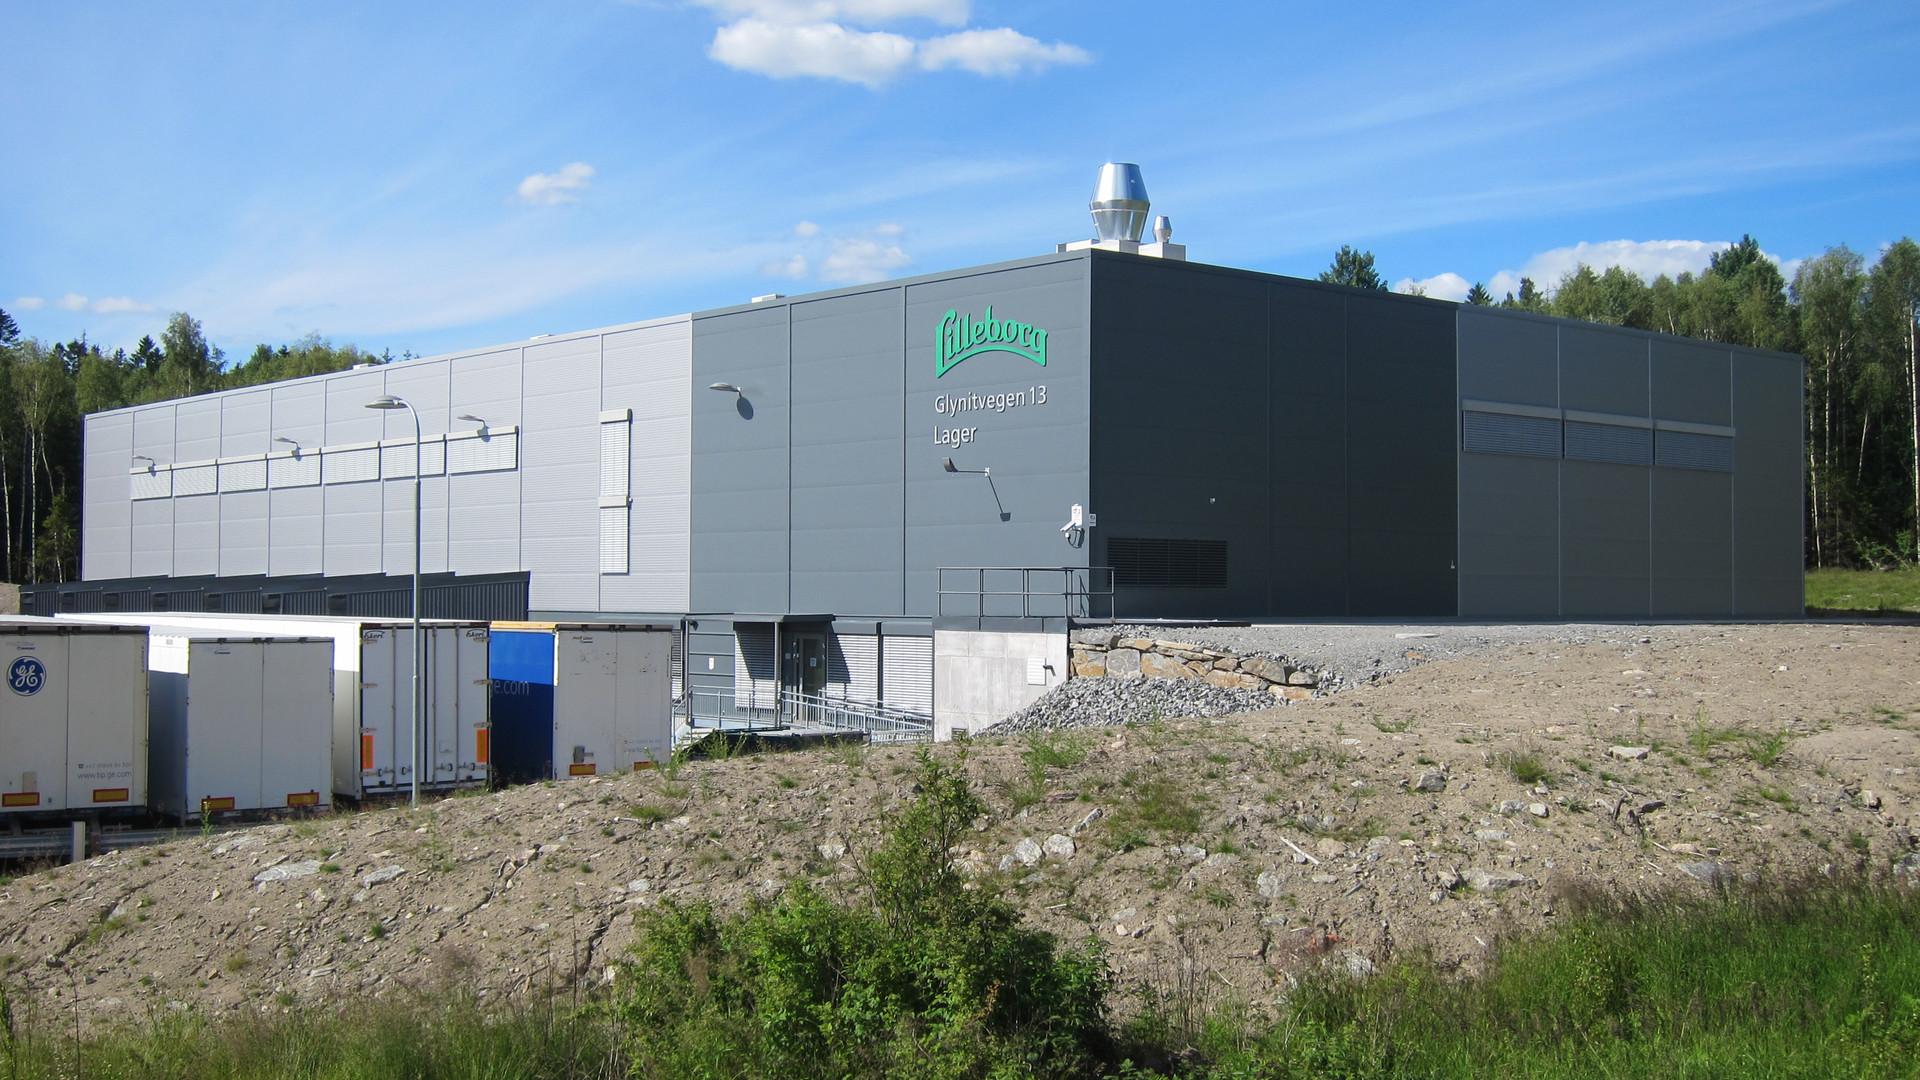 lilleborg/orkla main warehouse